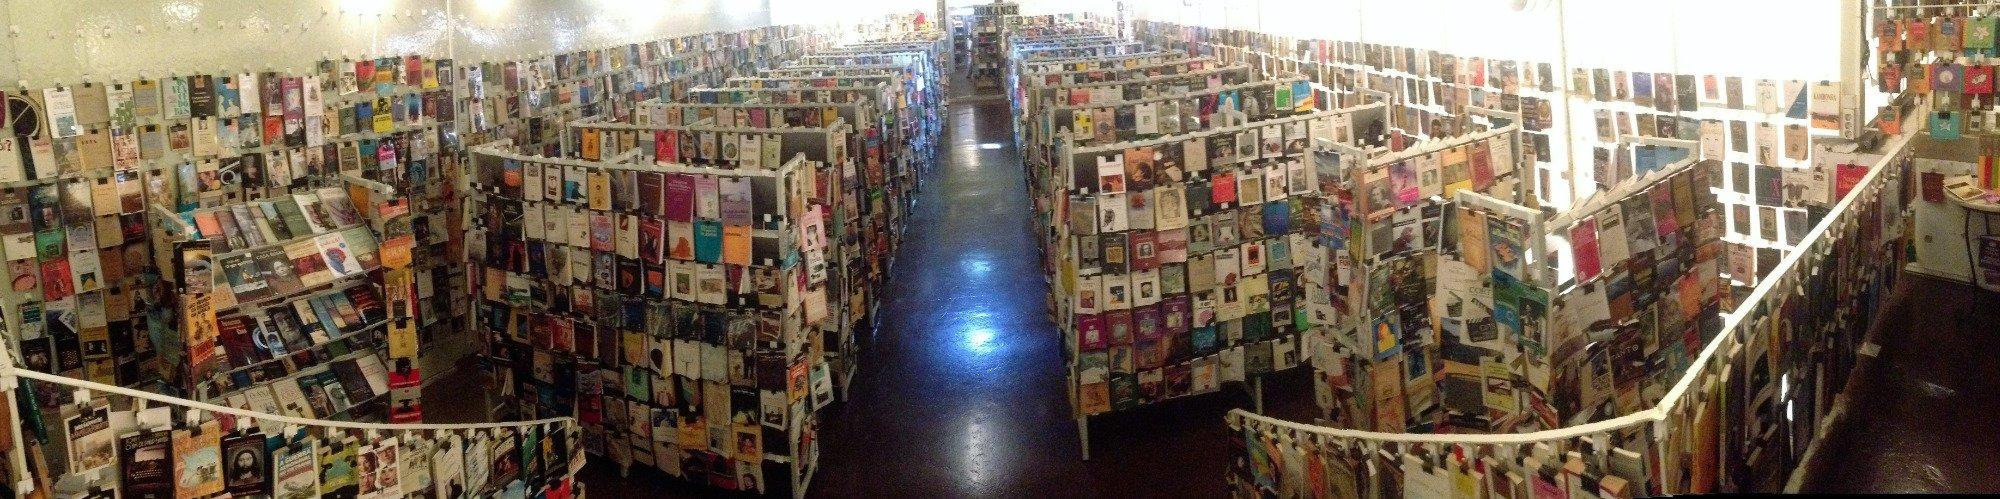 Livraria Esperança – Librairie Funchal